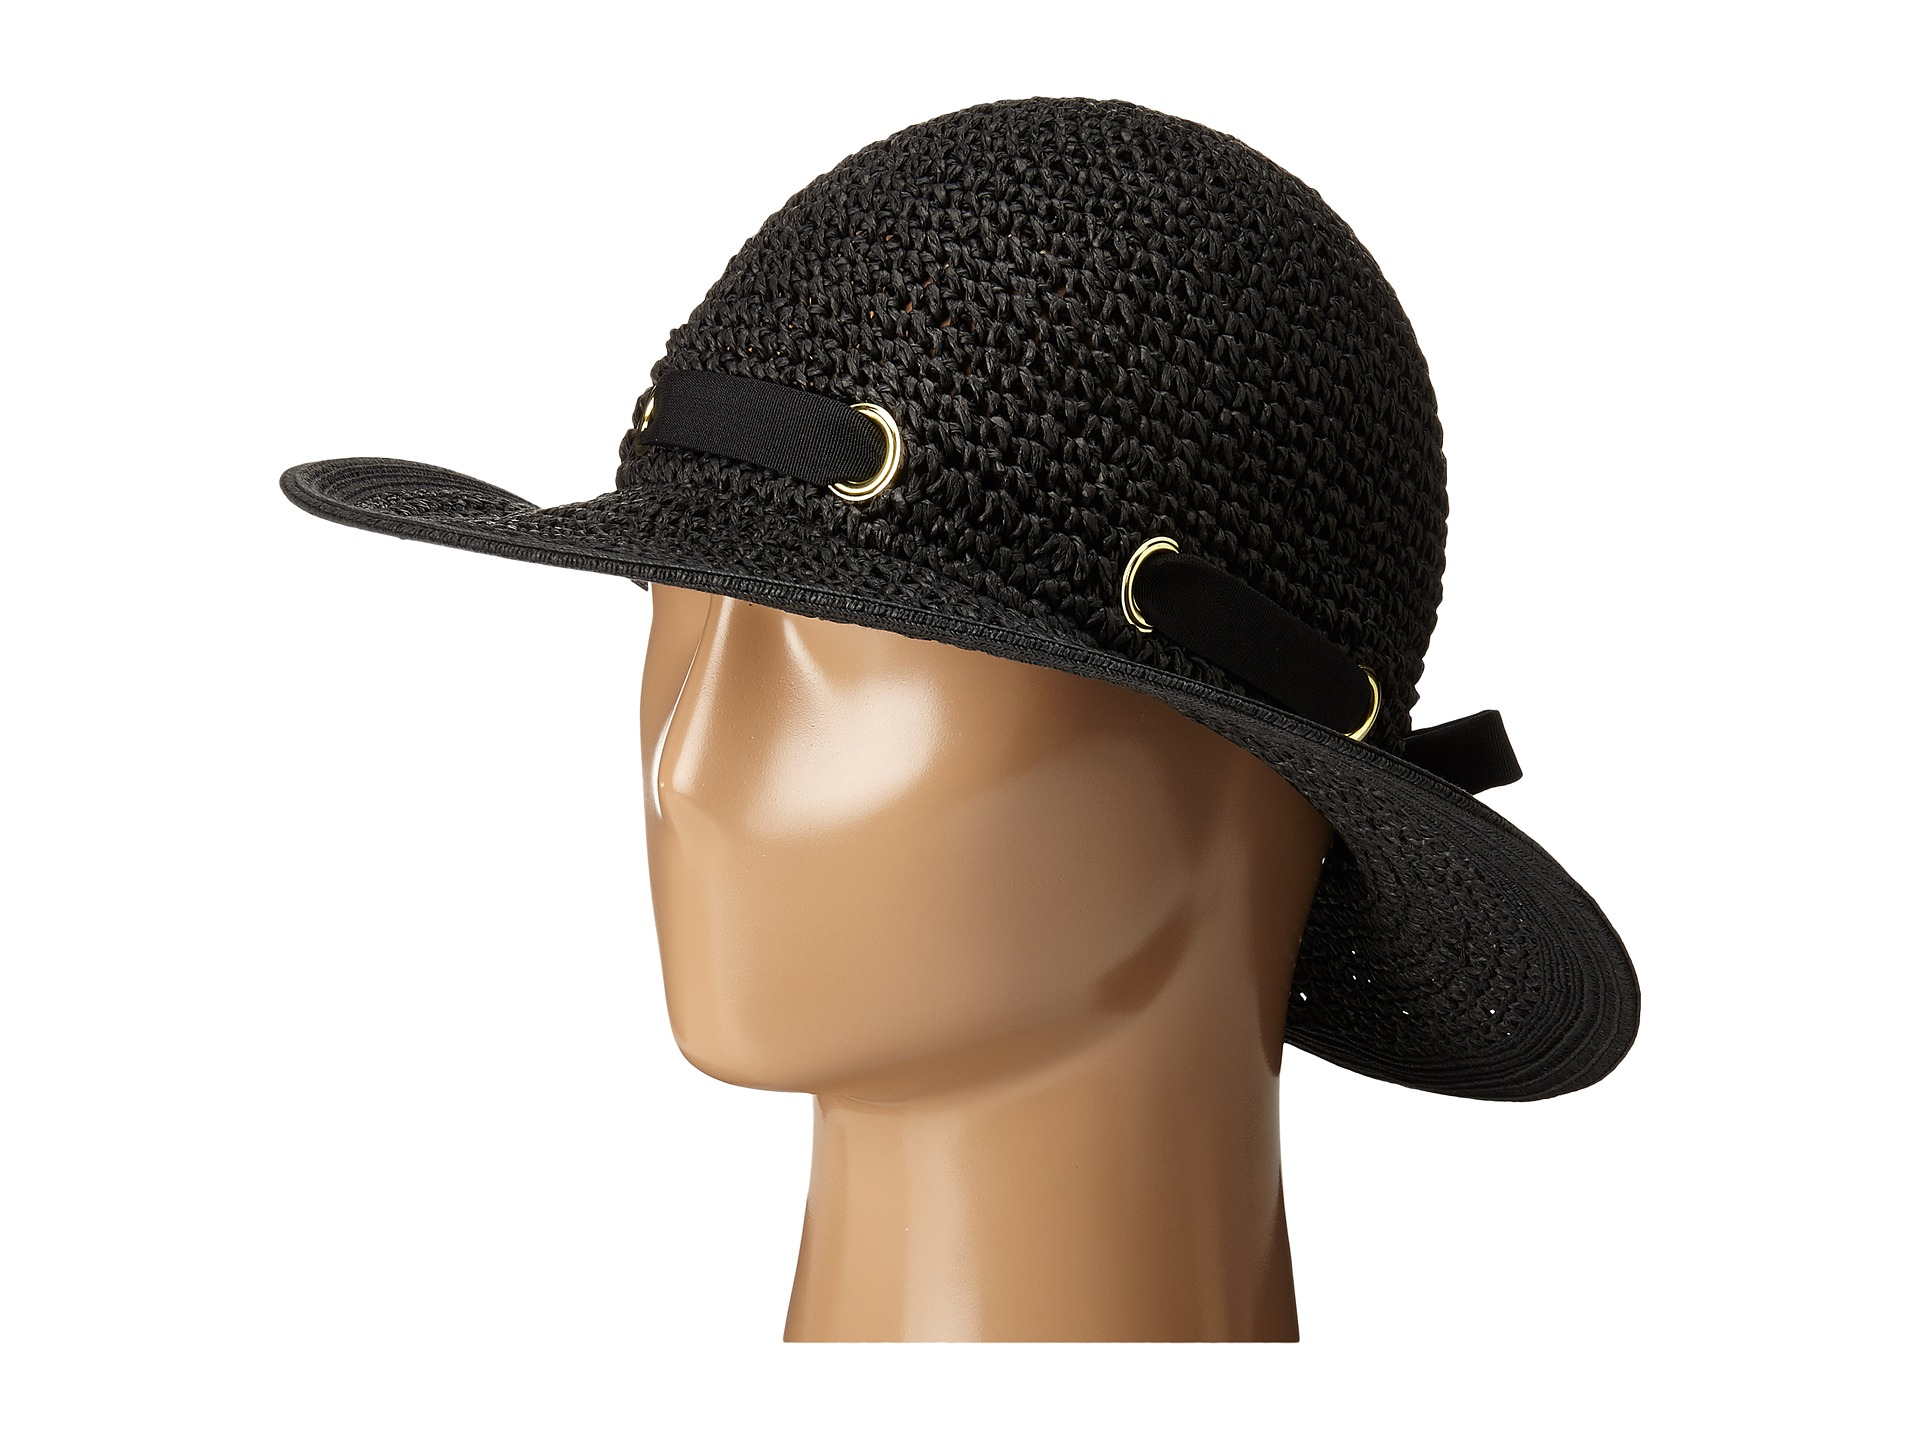 5409cfc4a14 Lyst - San Diego Hat Company Pbm1029 Crochet Floppy Hat With ...